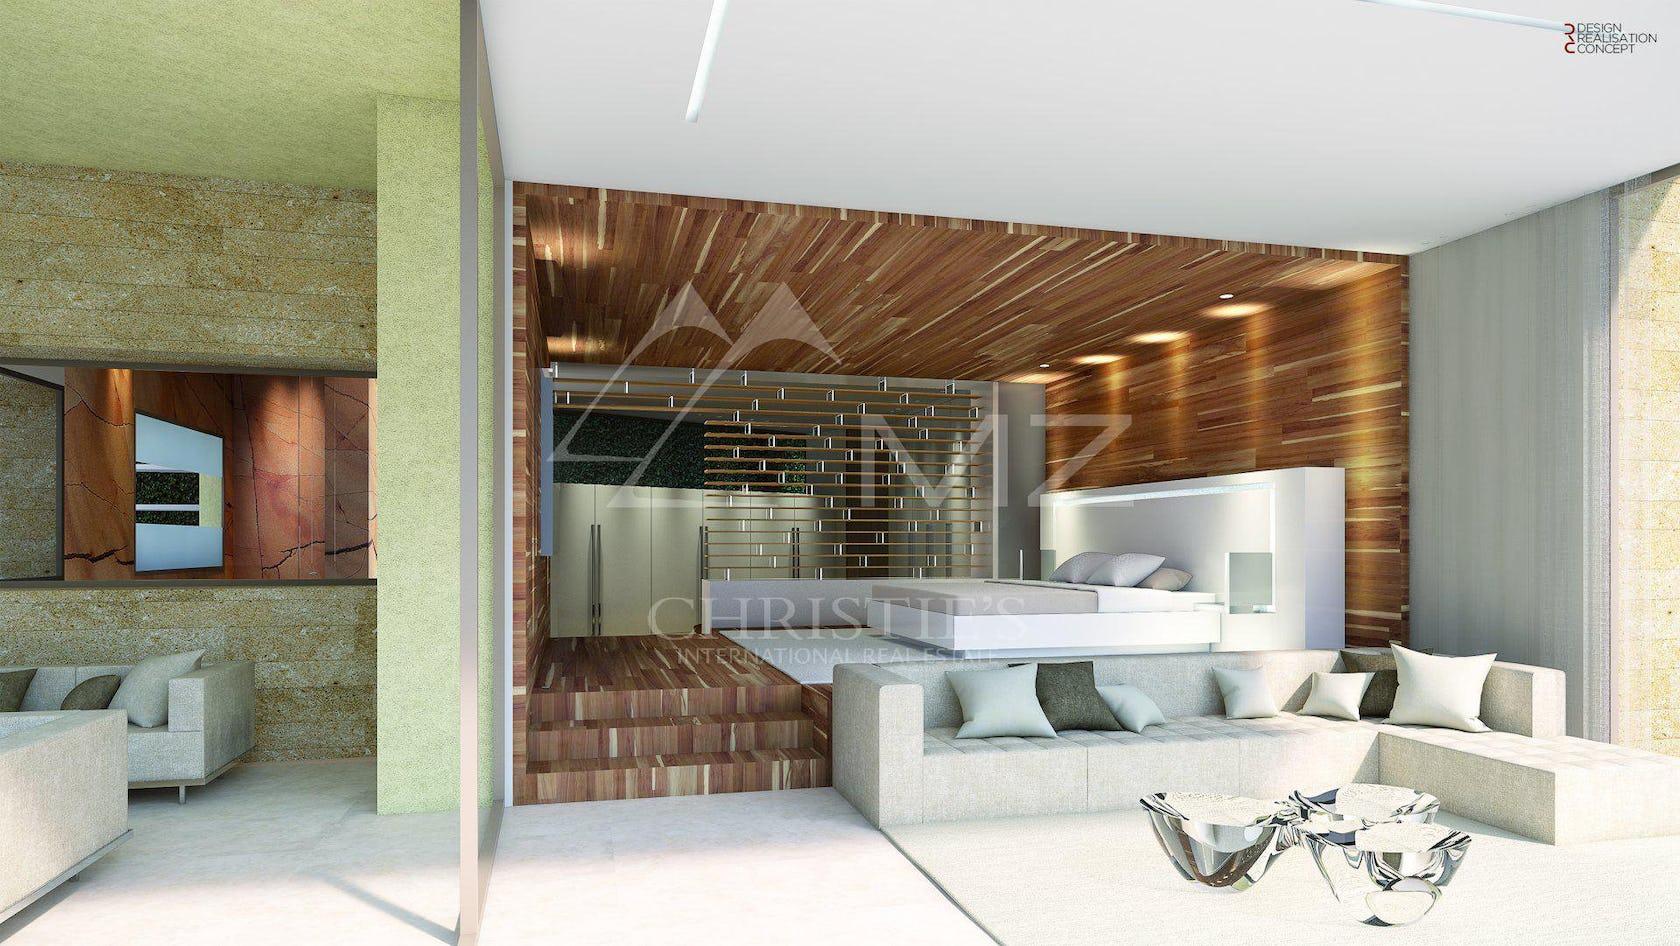 lobby room indoors flooring floor interior design living room furniture